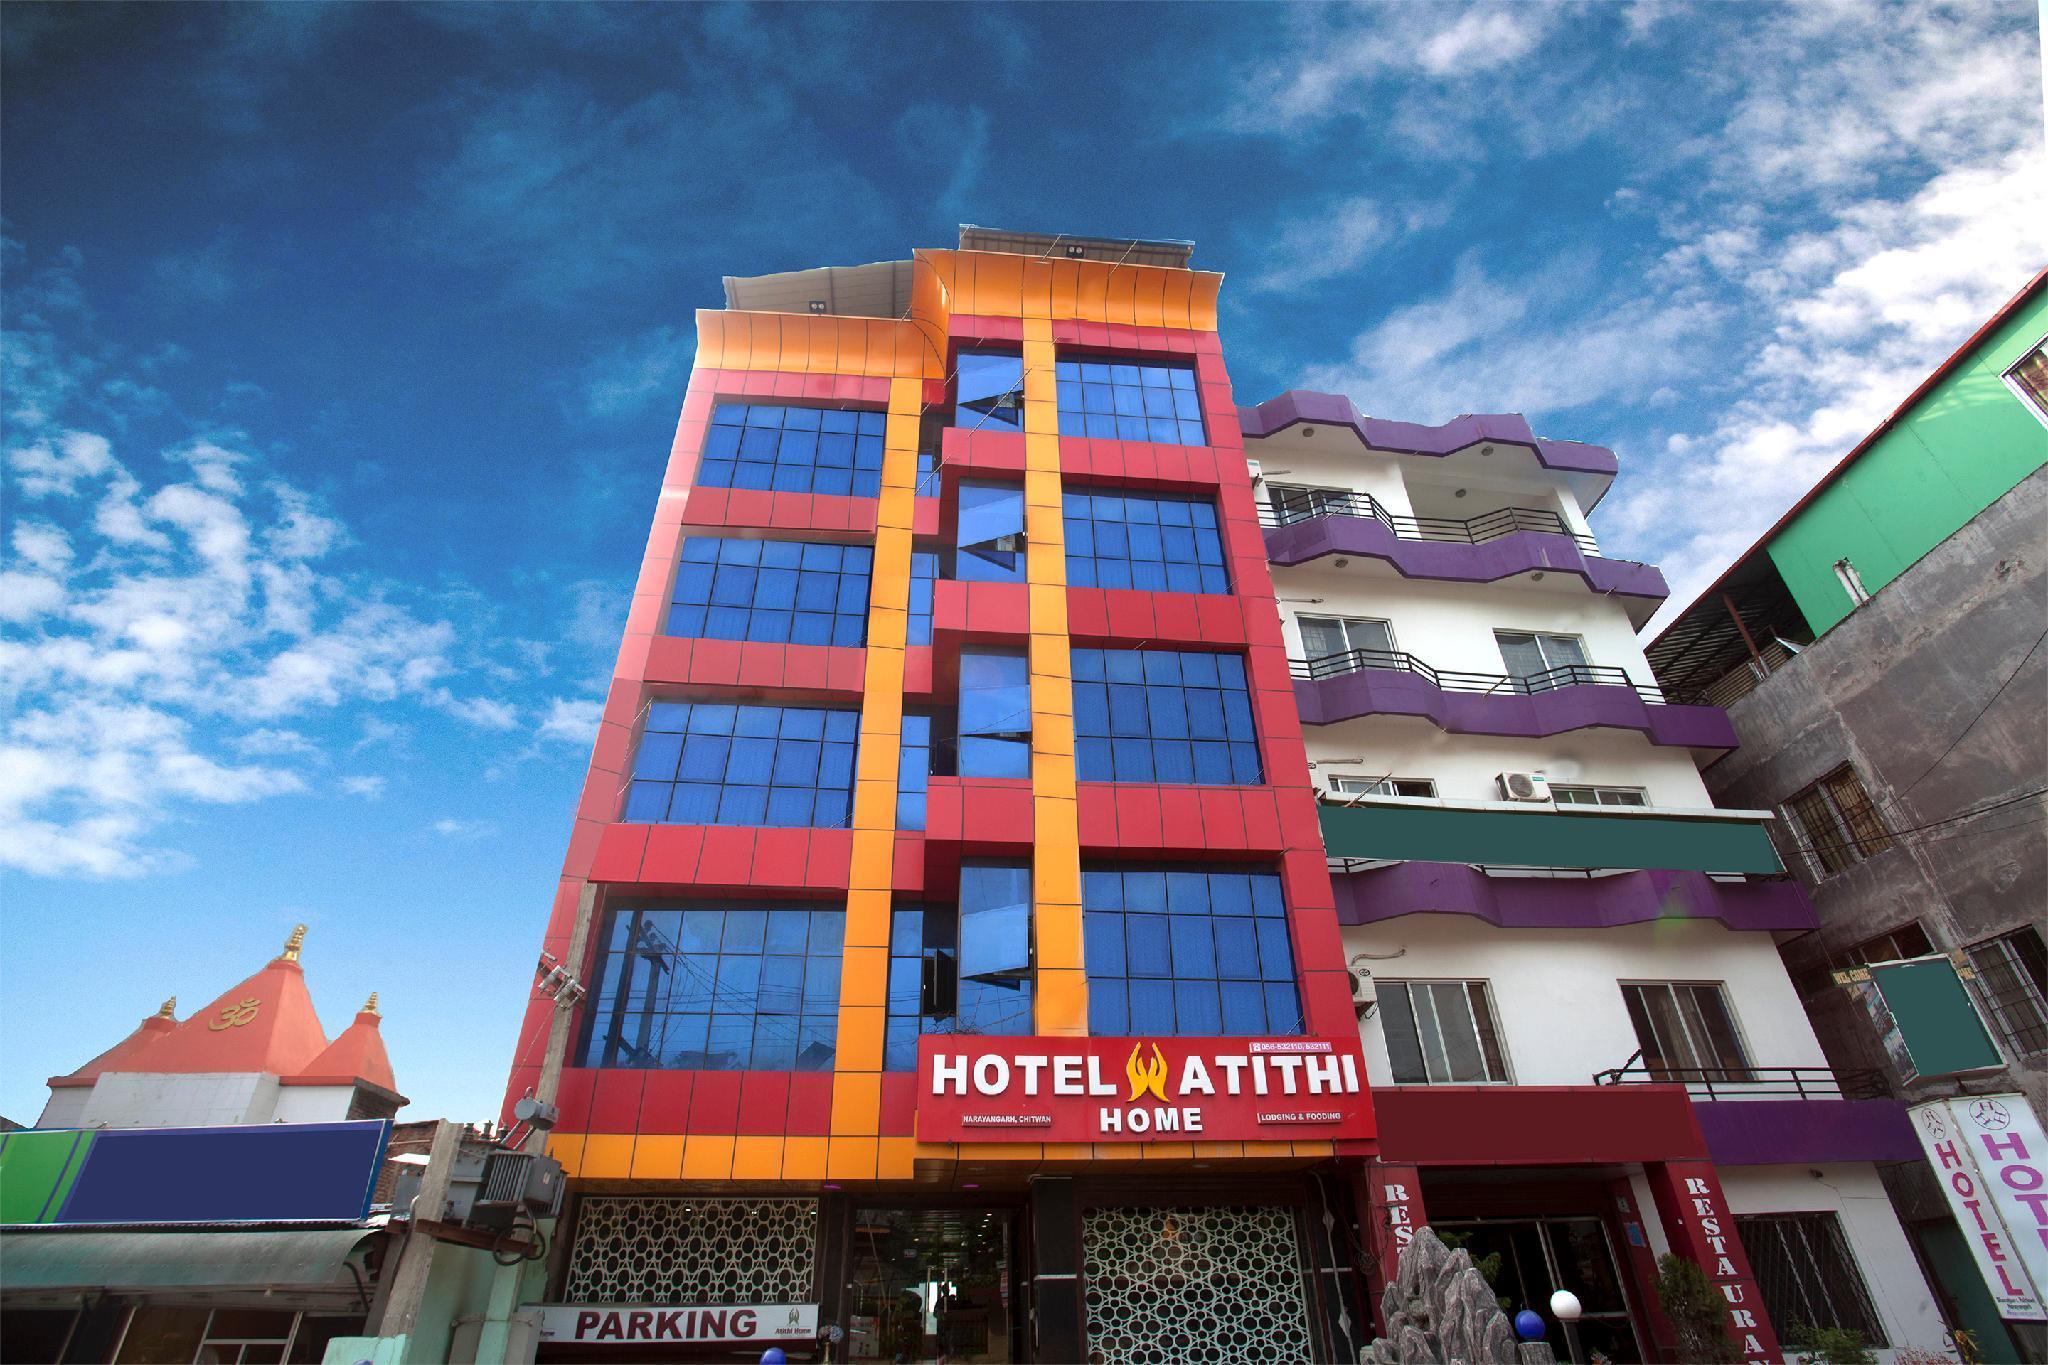 OYO 483 Hotel Atithi Home